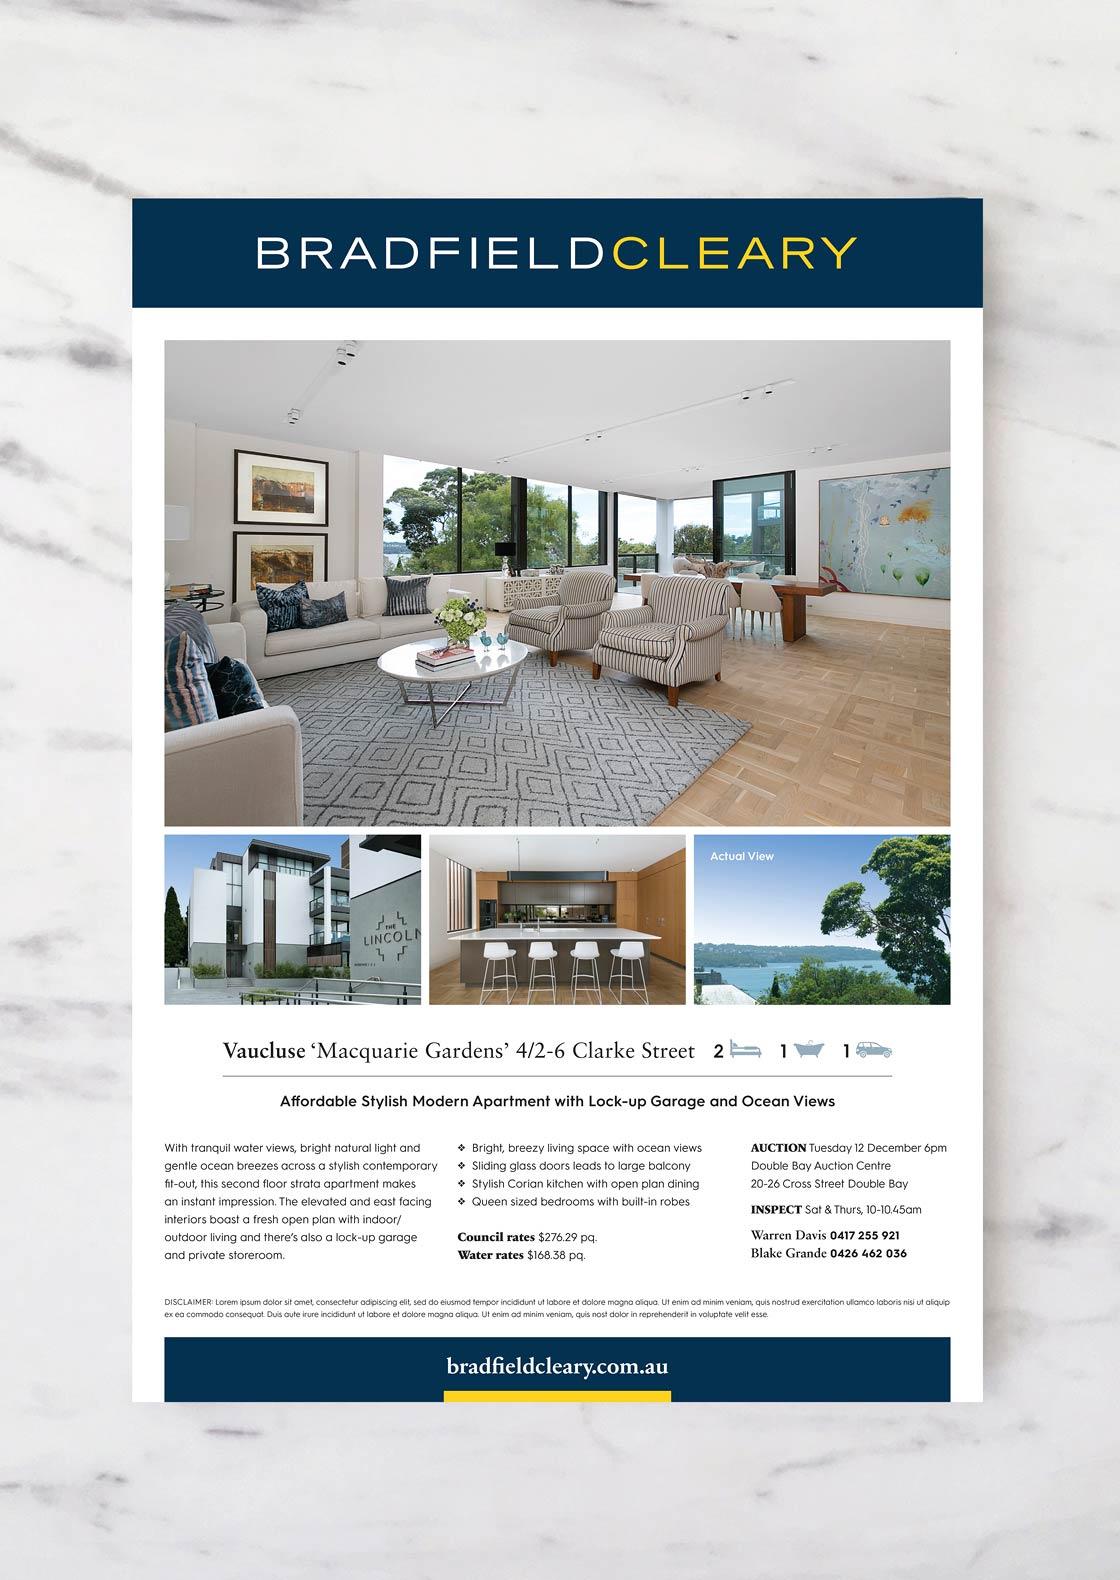 289fdf905dc Bradfield Cleary - Northwood Green